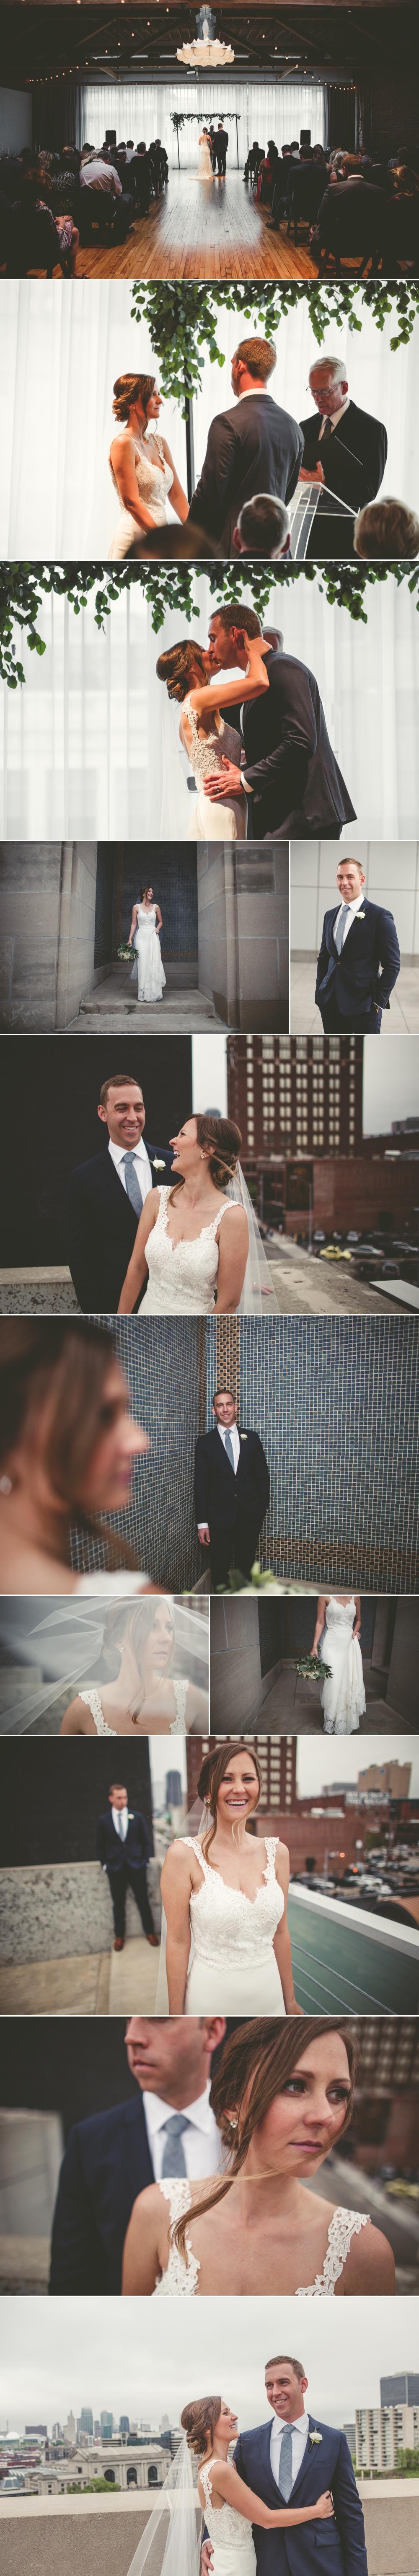 jason_domingues_photography_best_kansas_city_wedding_photographer_kc_weddings_berg_0002.jpg